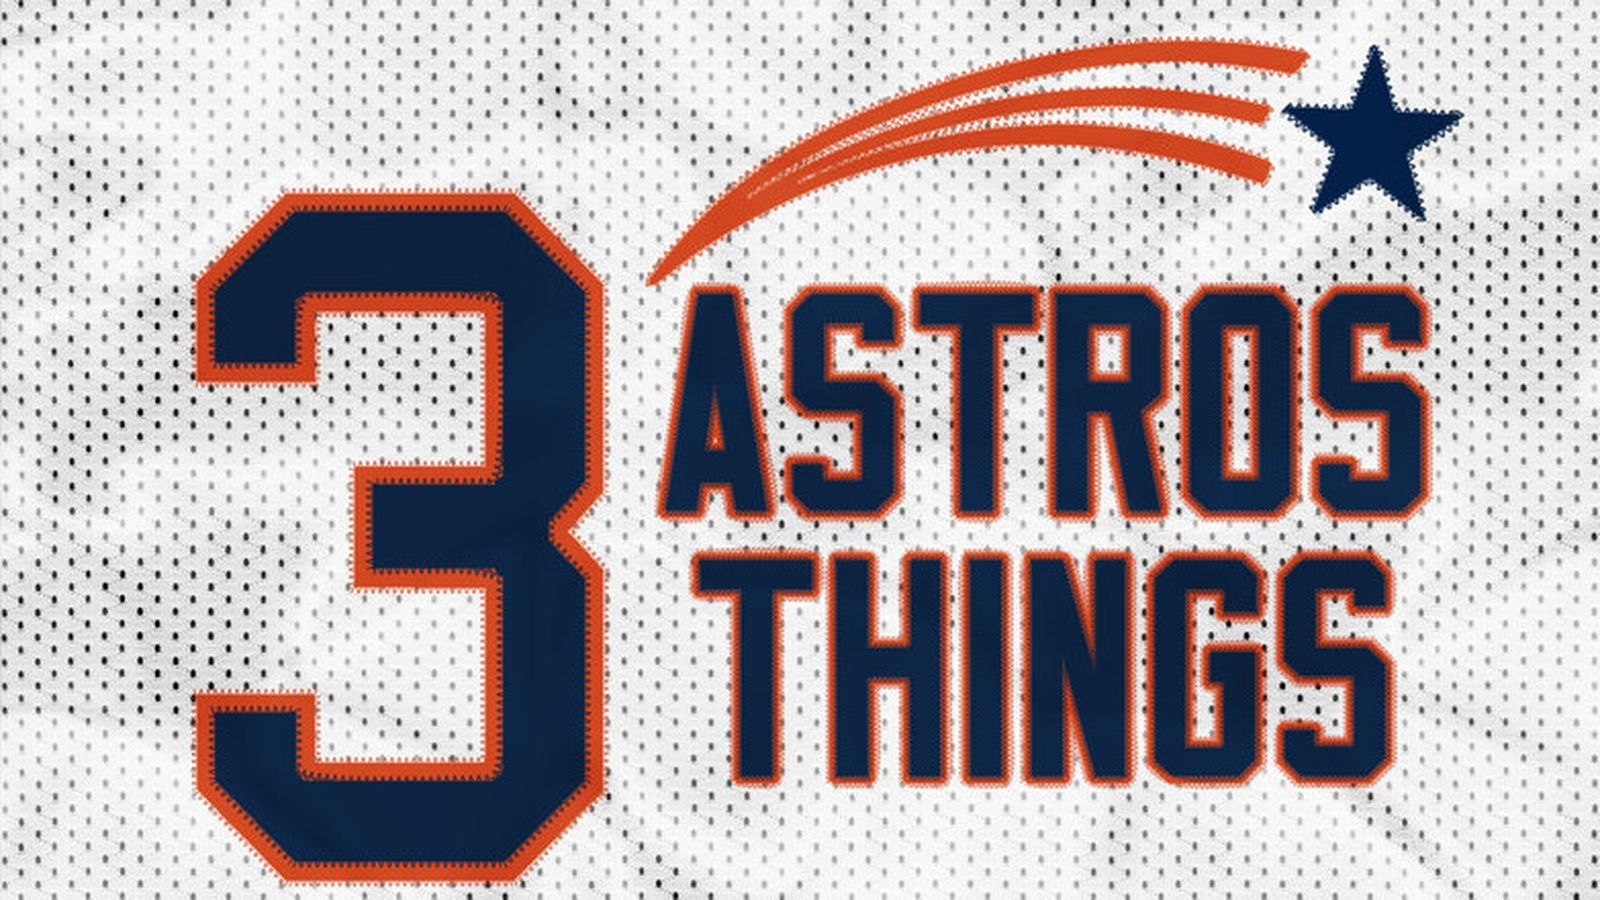 Threethings_shooting-star.0_standard_783.0.0.0